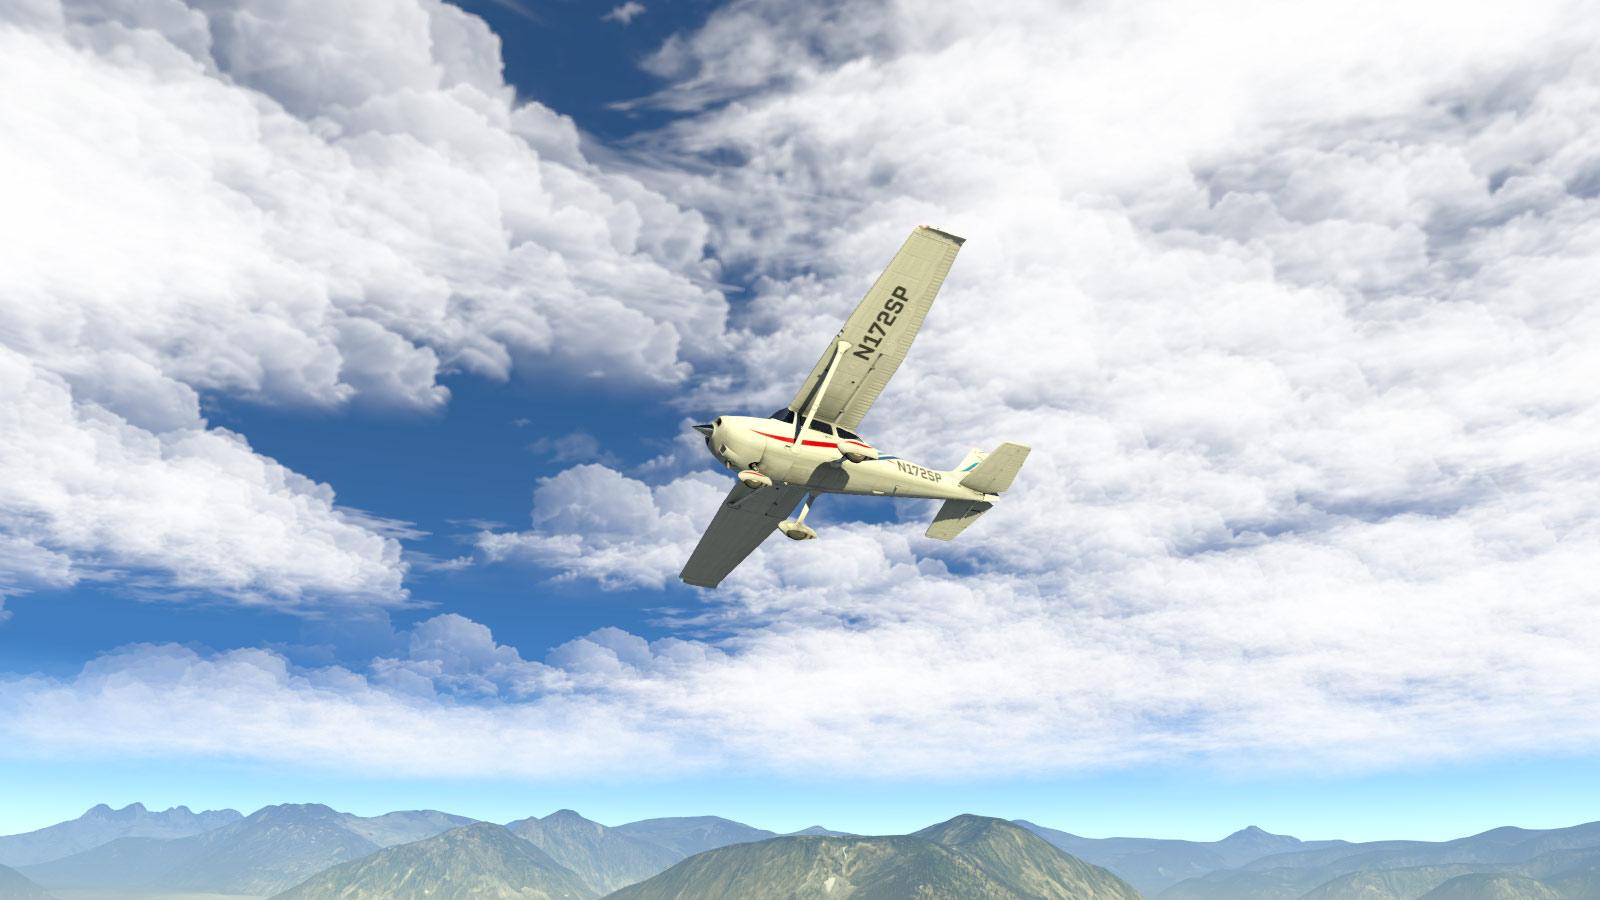 Simulator Modifications : Project BetterSky - X-Plane